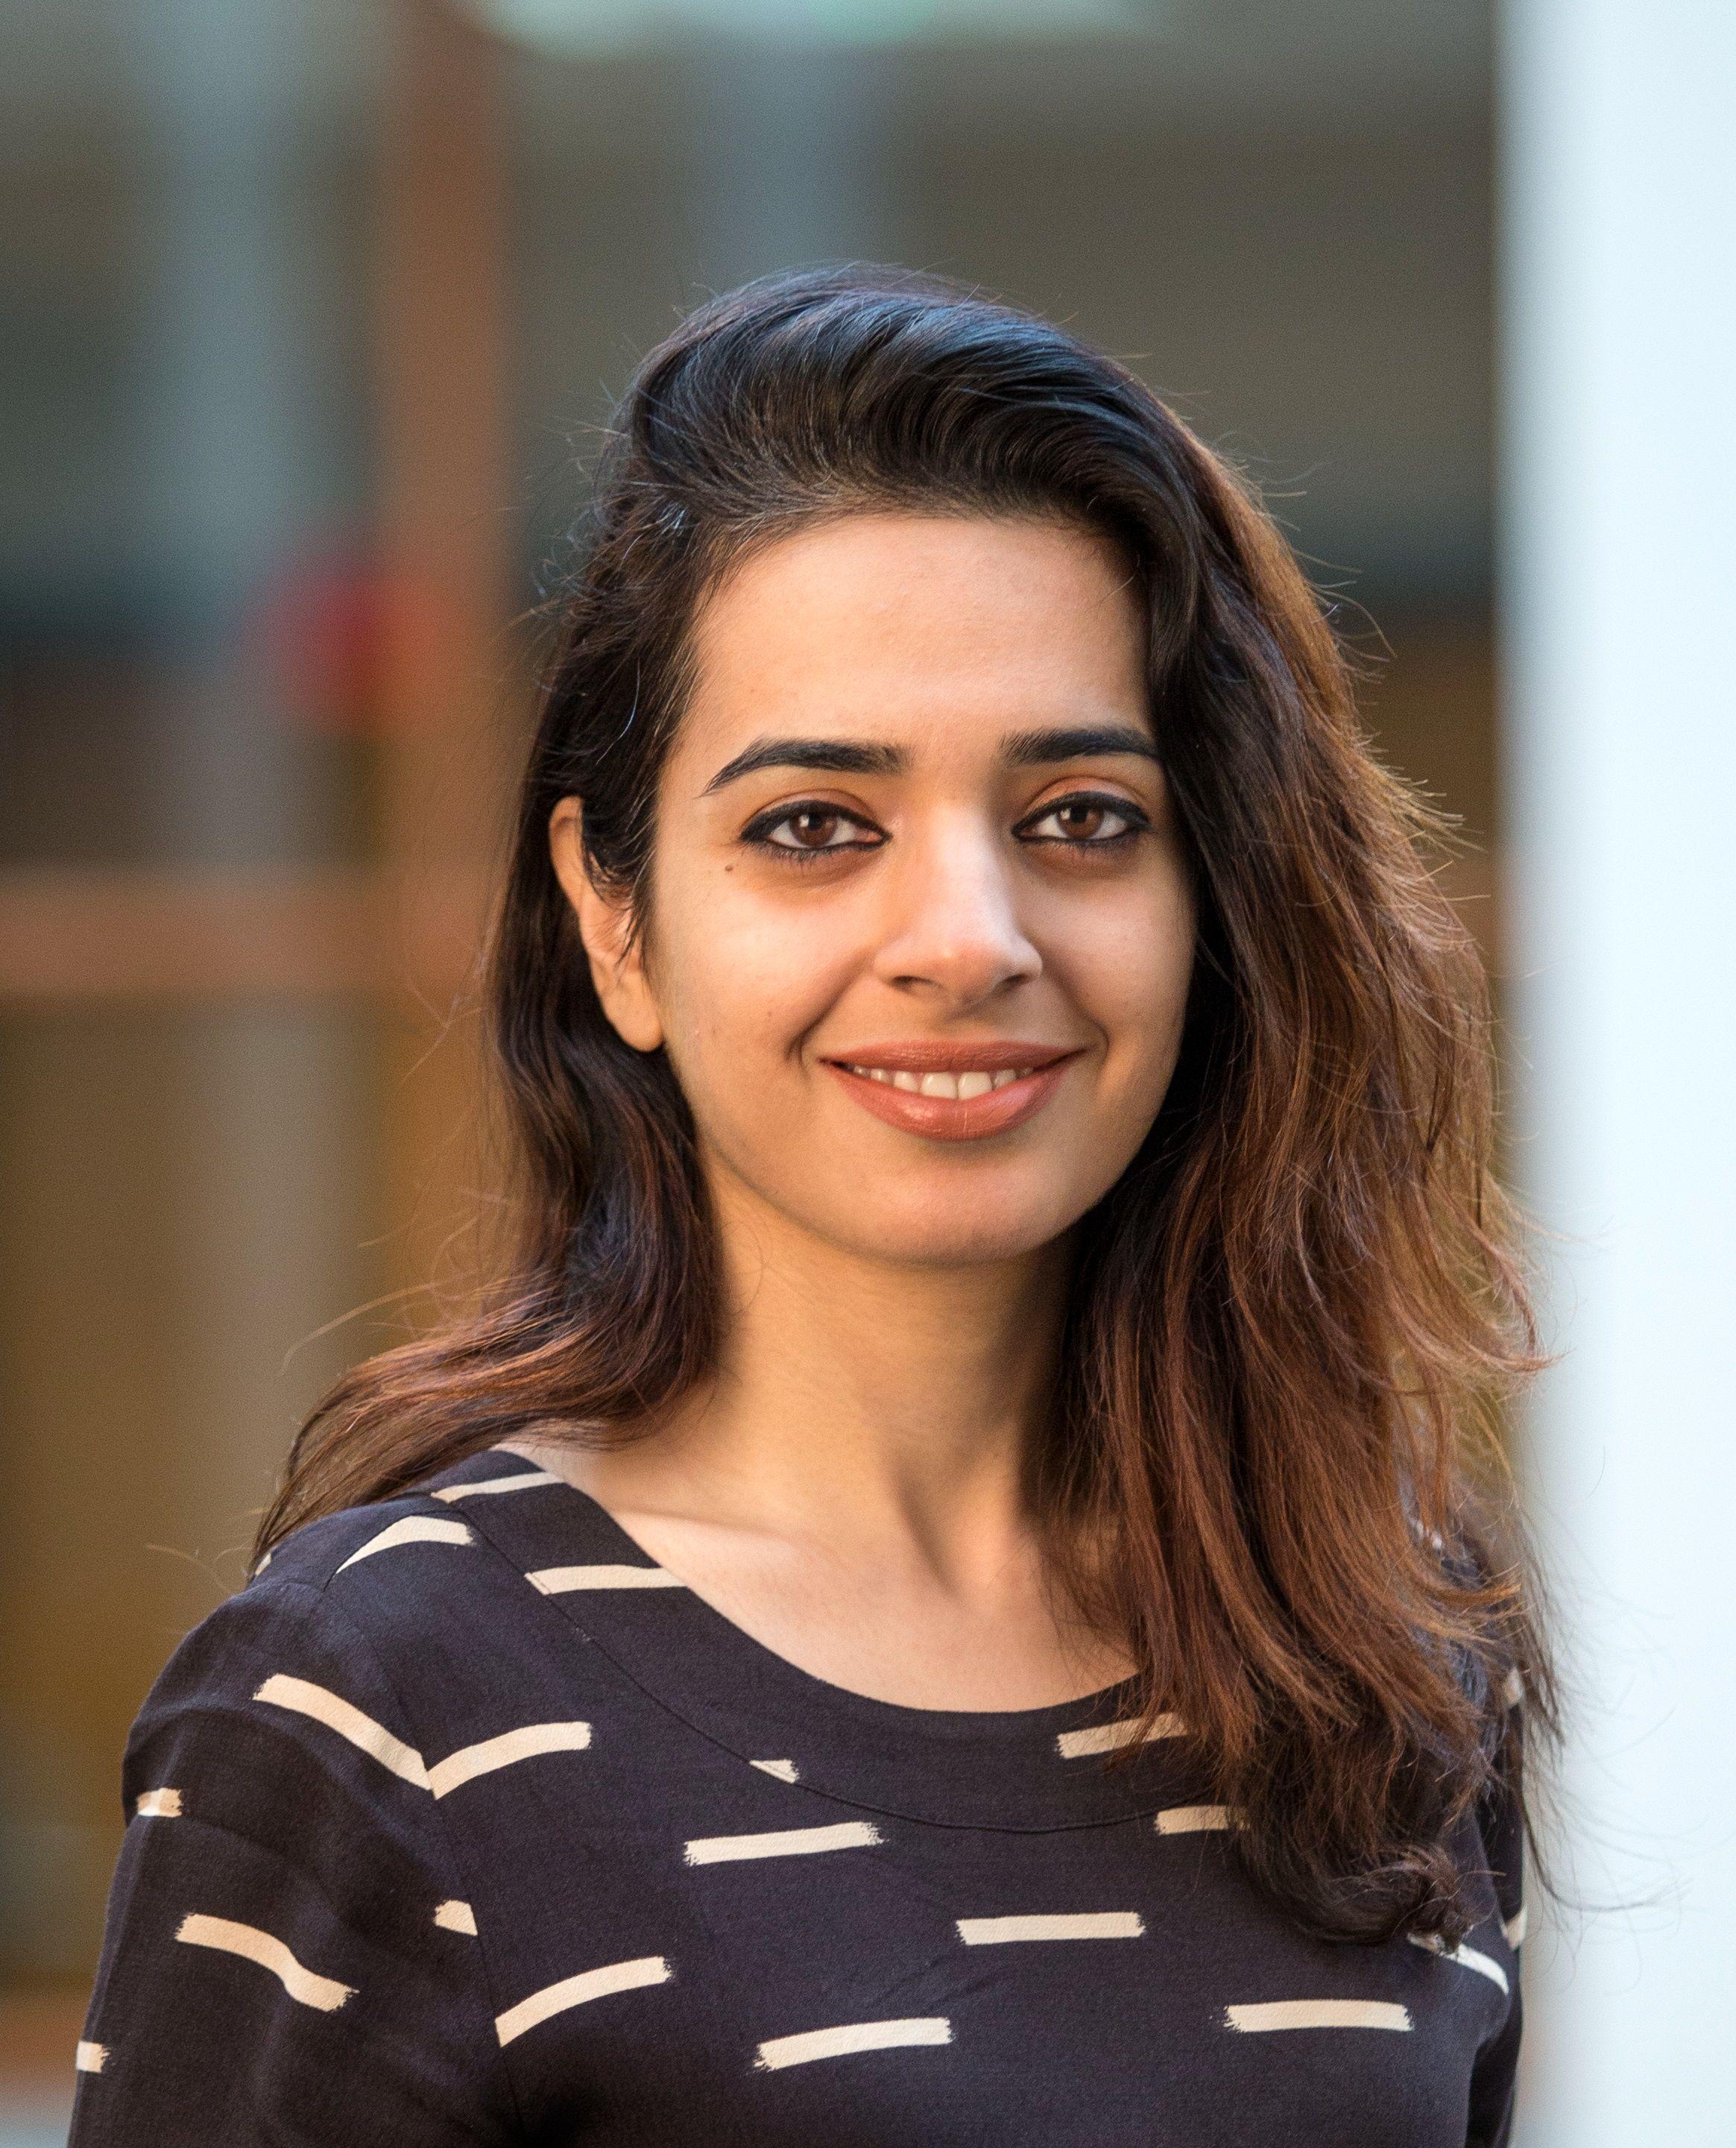 shailu Hacker Noon profile picture